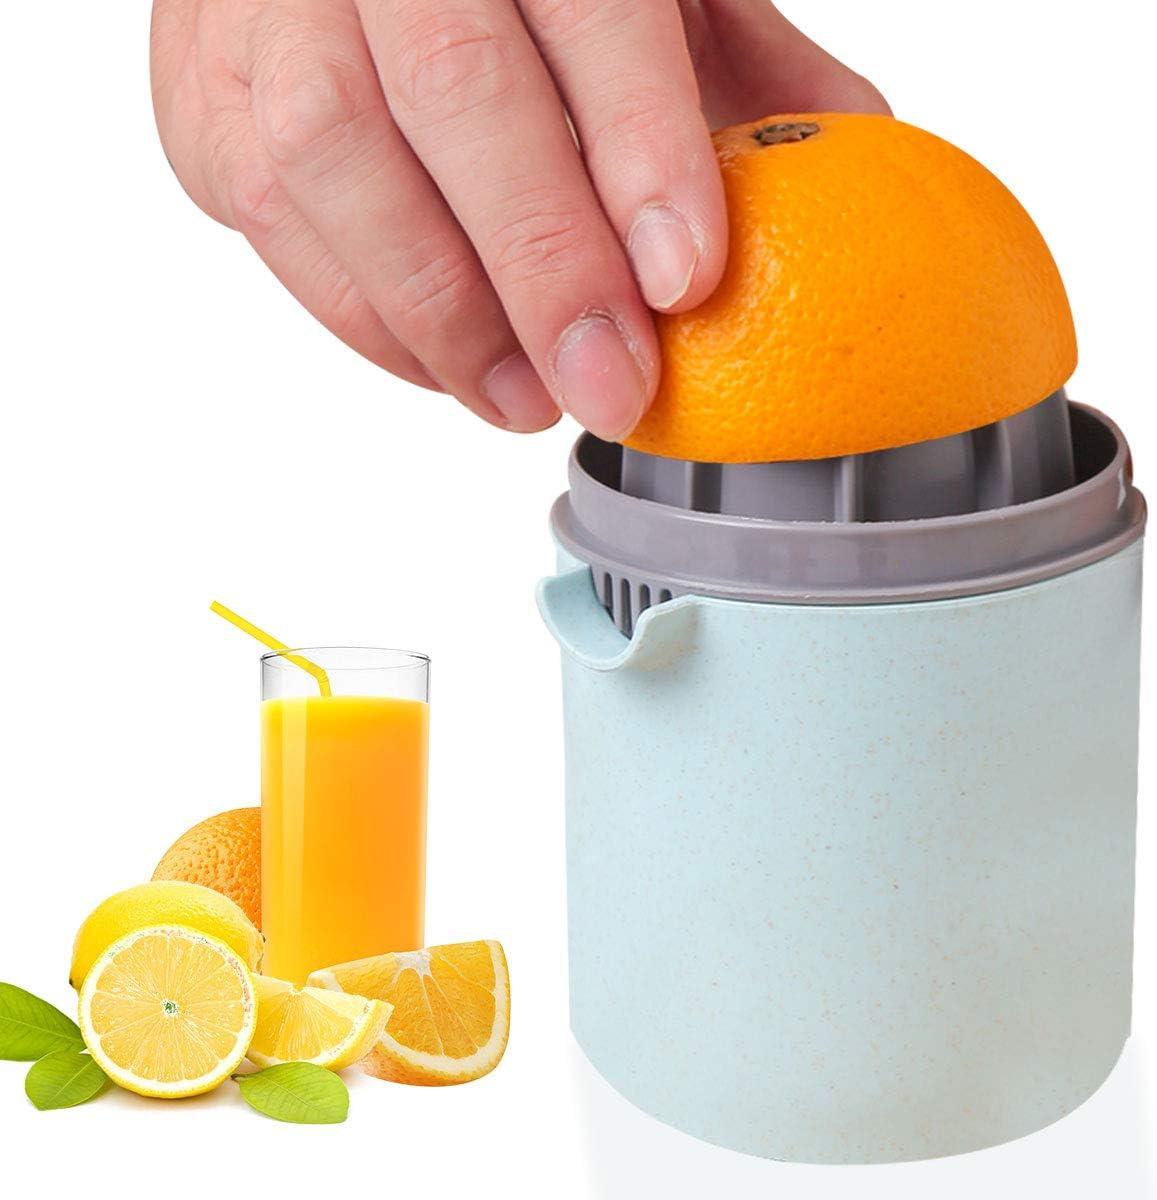 Manual Juicer, Citrus Juicer Lemon Squeezer Hand Juicer Citrus Squeezer Maker with Strainer and Container, Blue -JH JIEMEI HOME